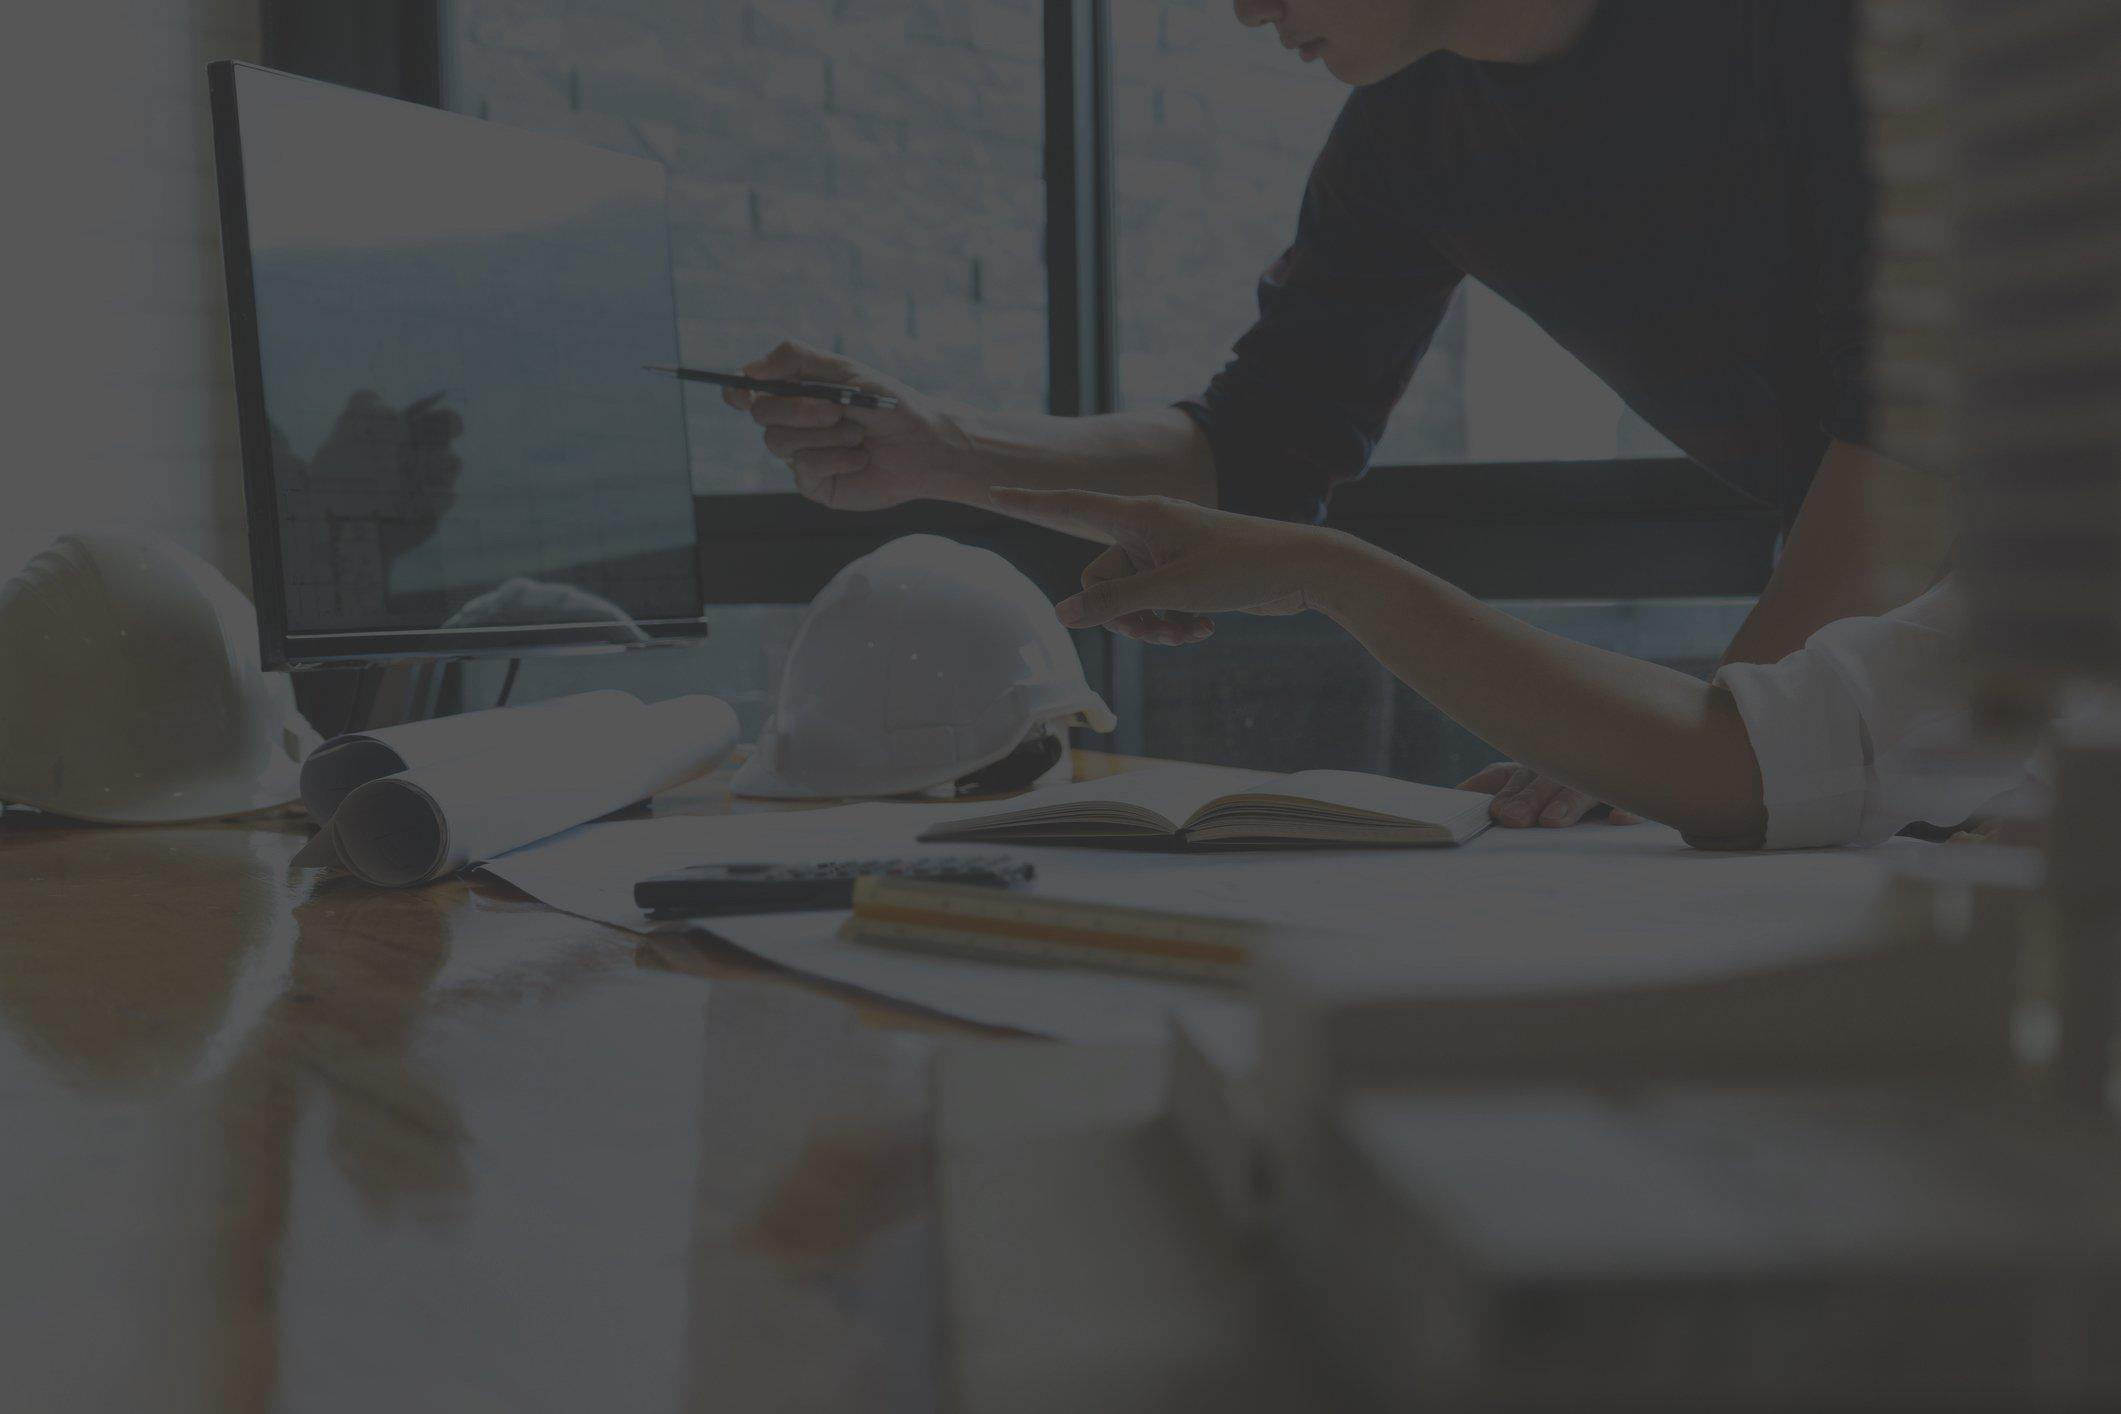 Vendor Neutrality & Open Source: Optimizing the Data Center Design Process